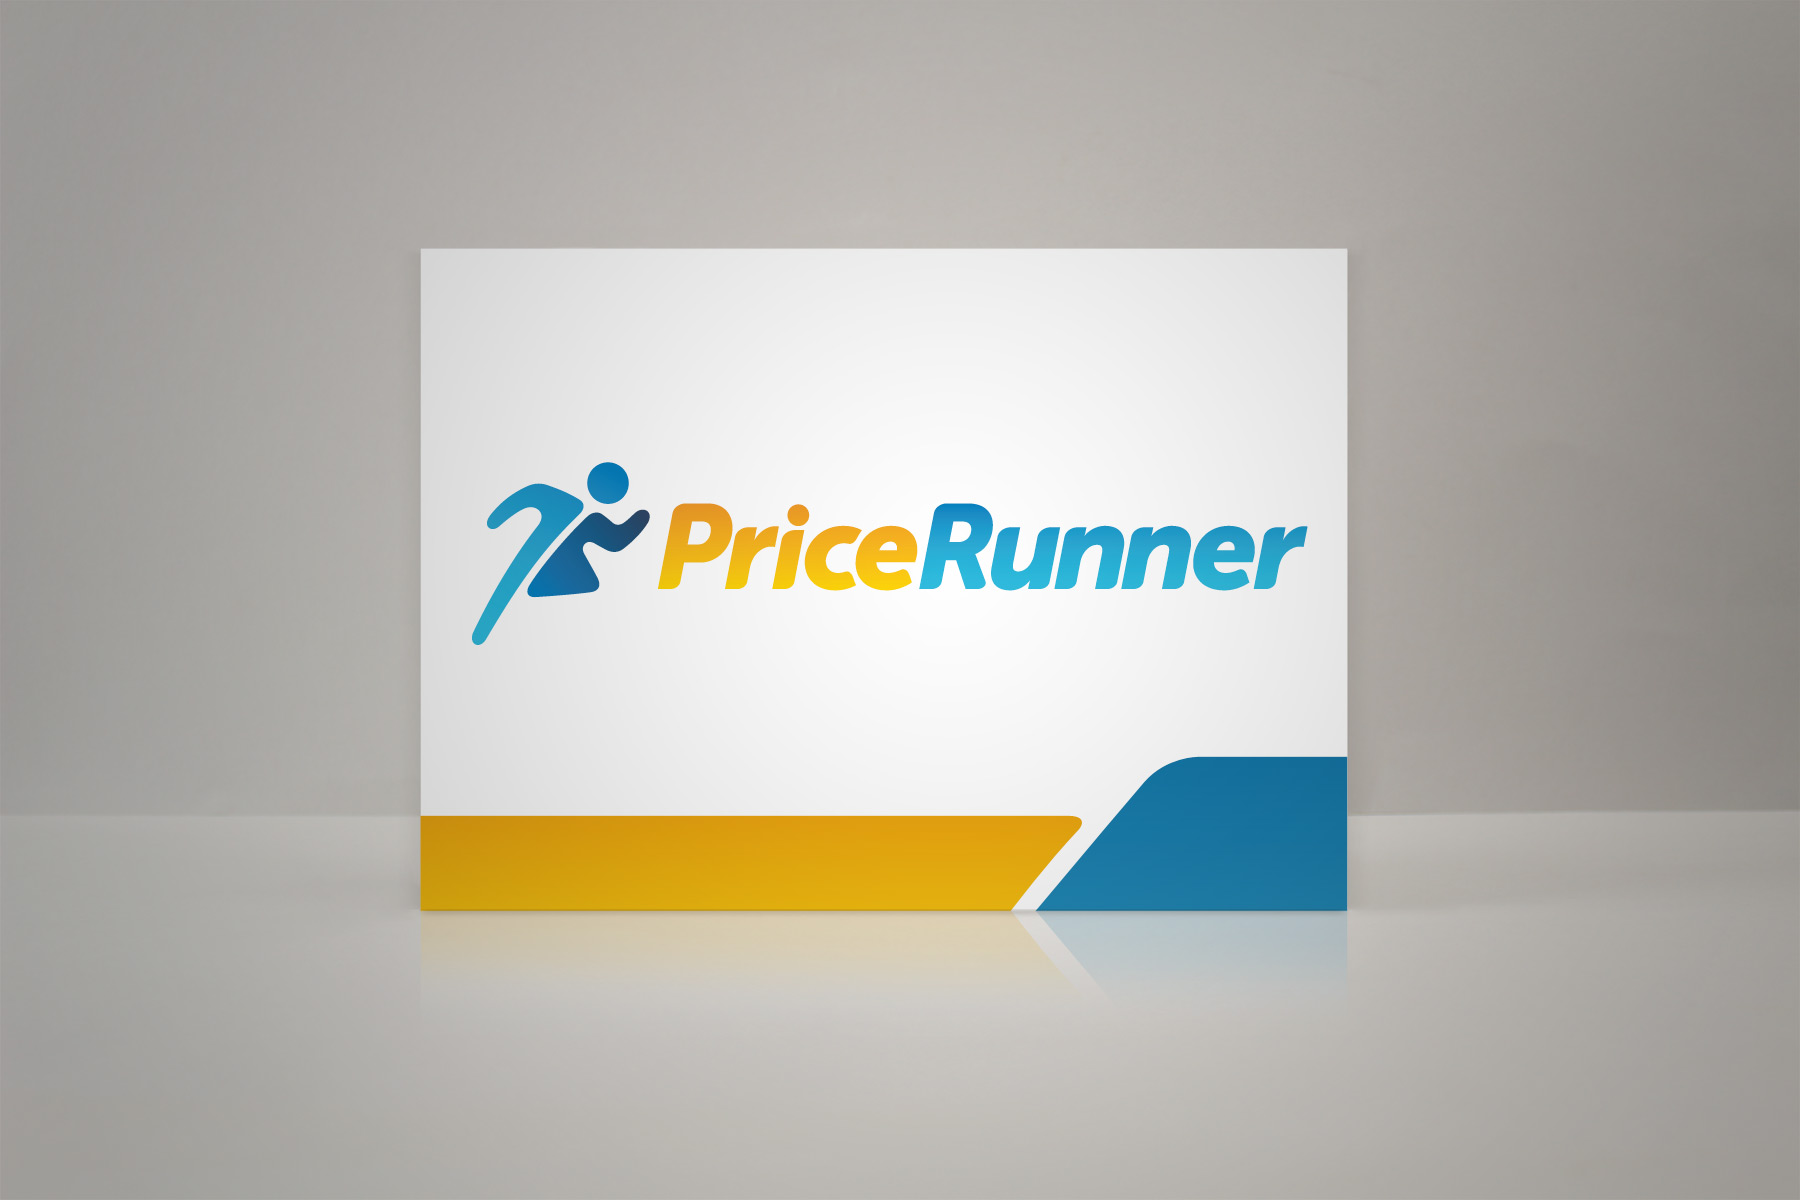 pricerunner_004